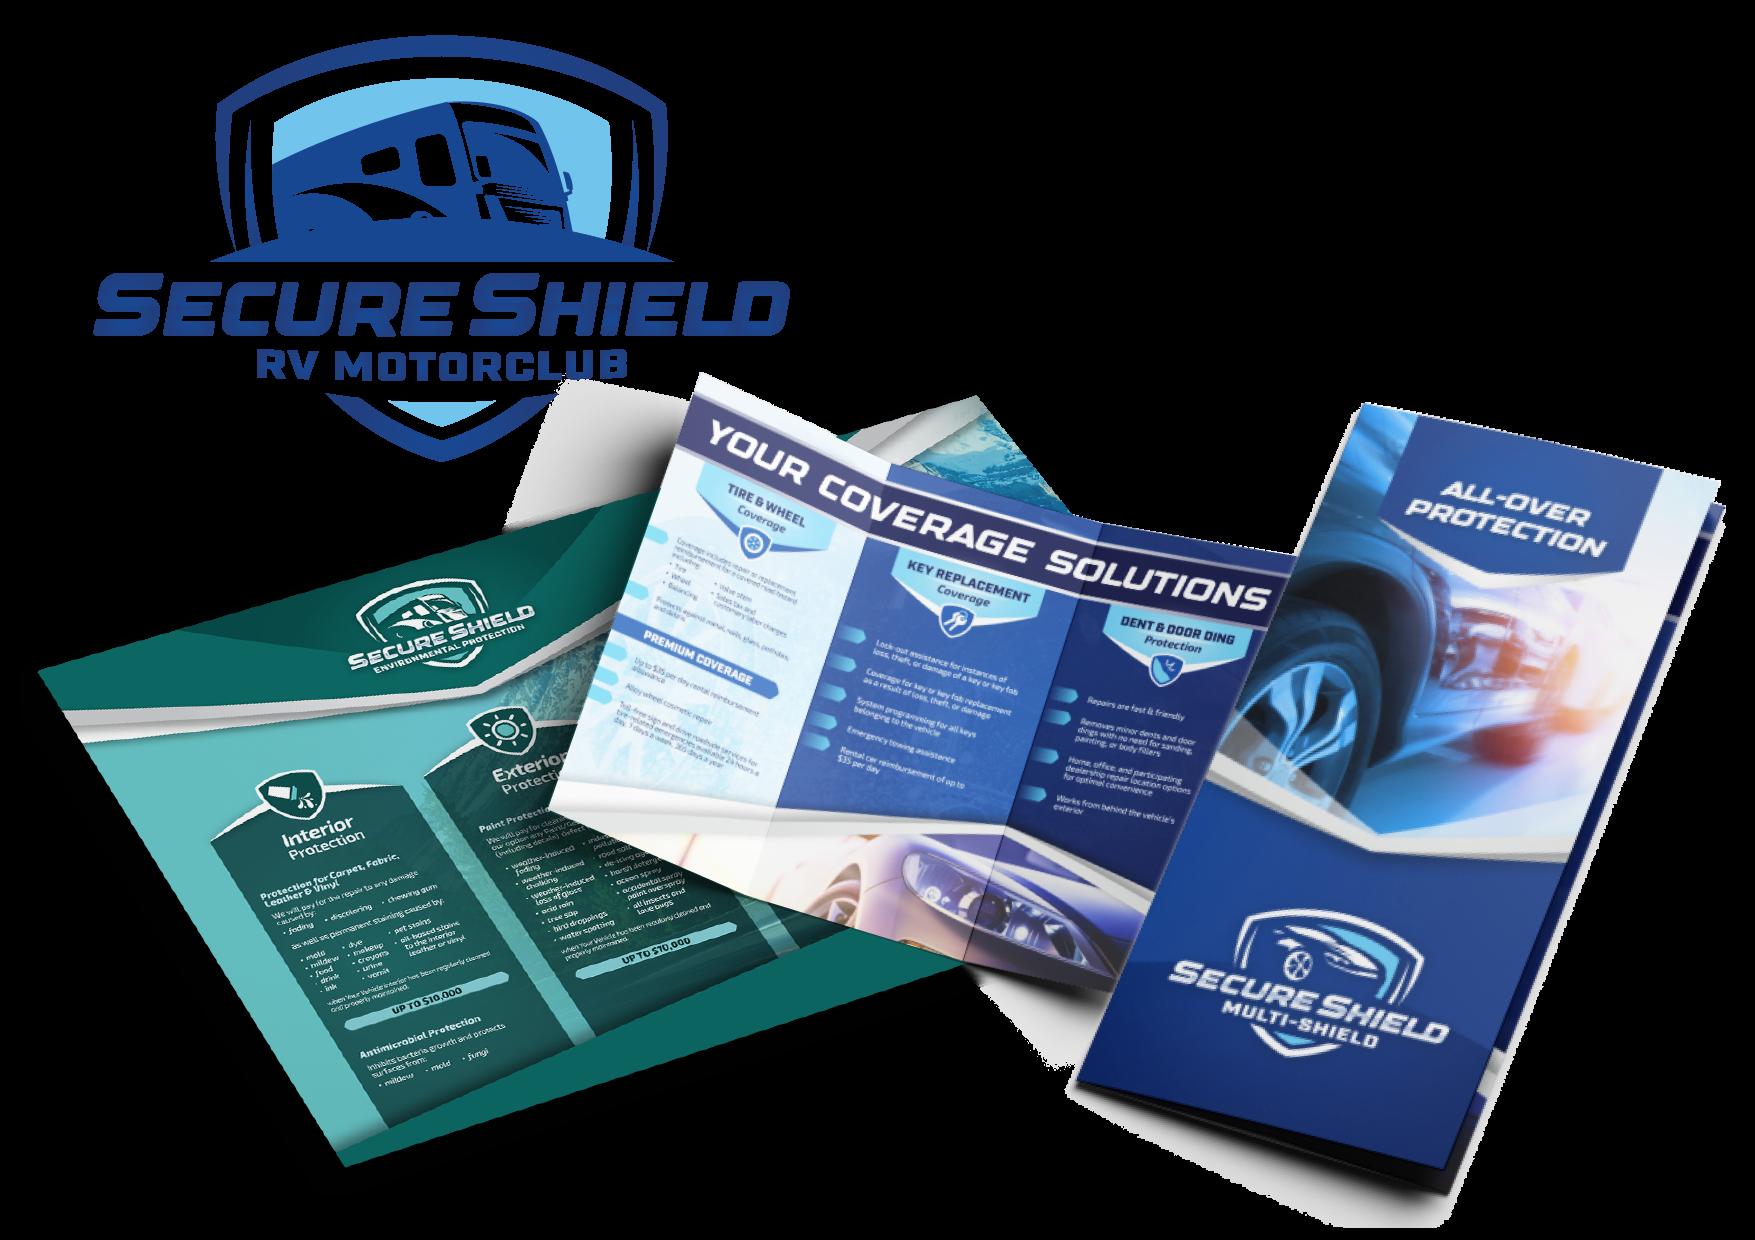 Branding & Logo Package